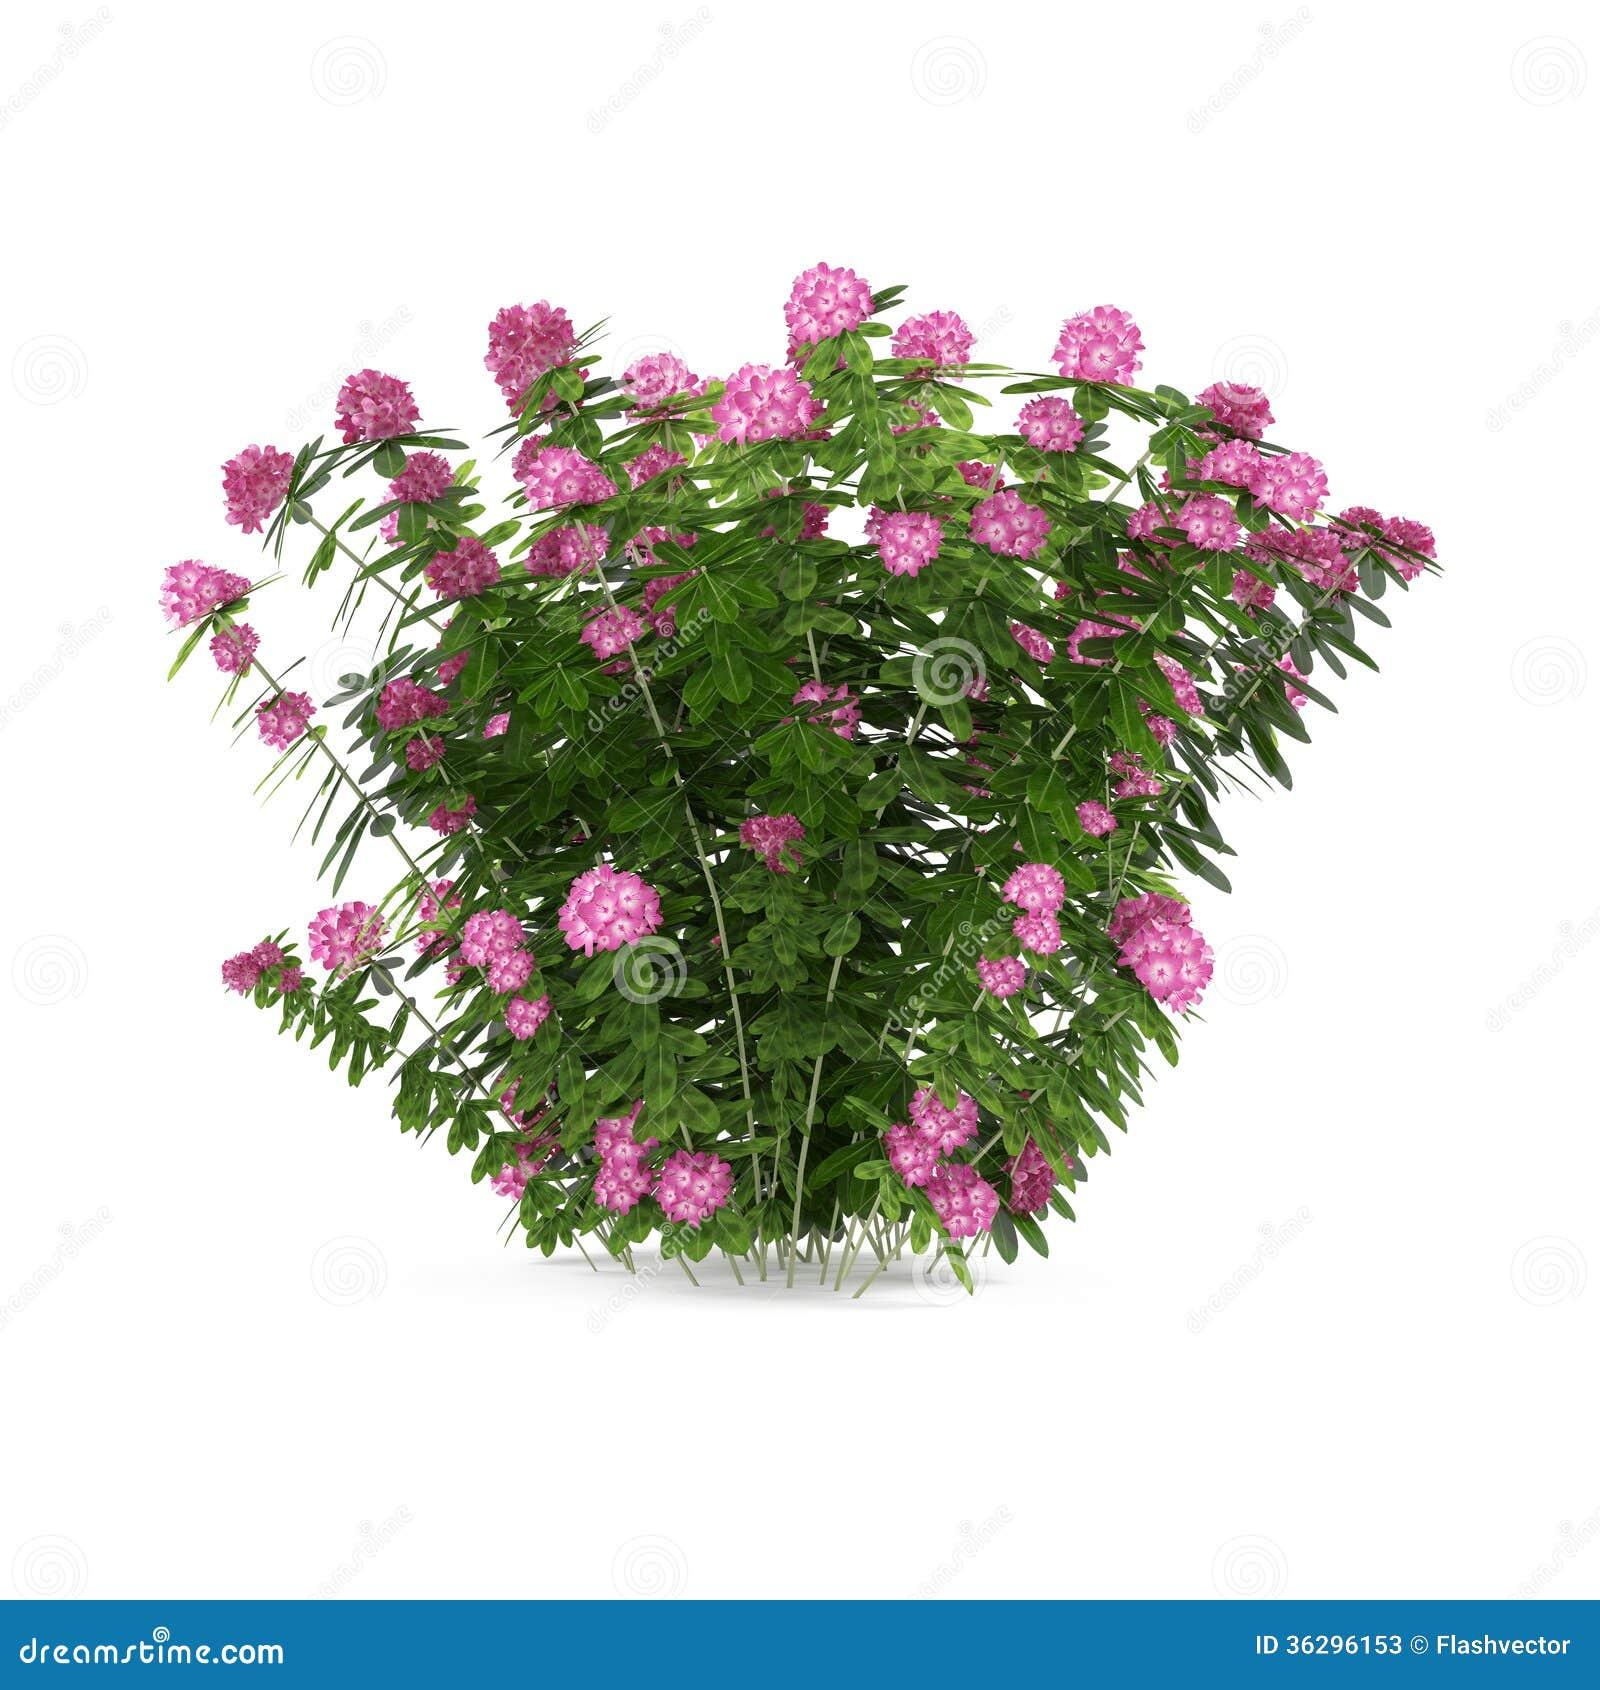 Plant bush with pink flowers stock illustration for Arbustos de jardin con flores